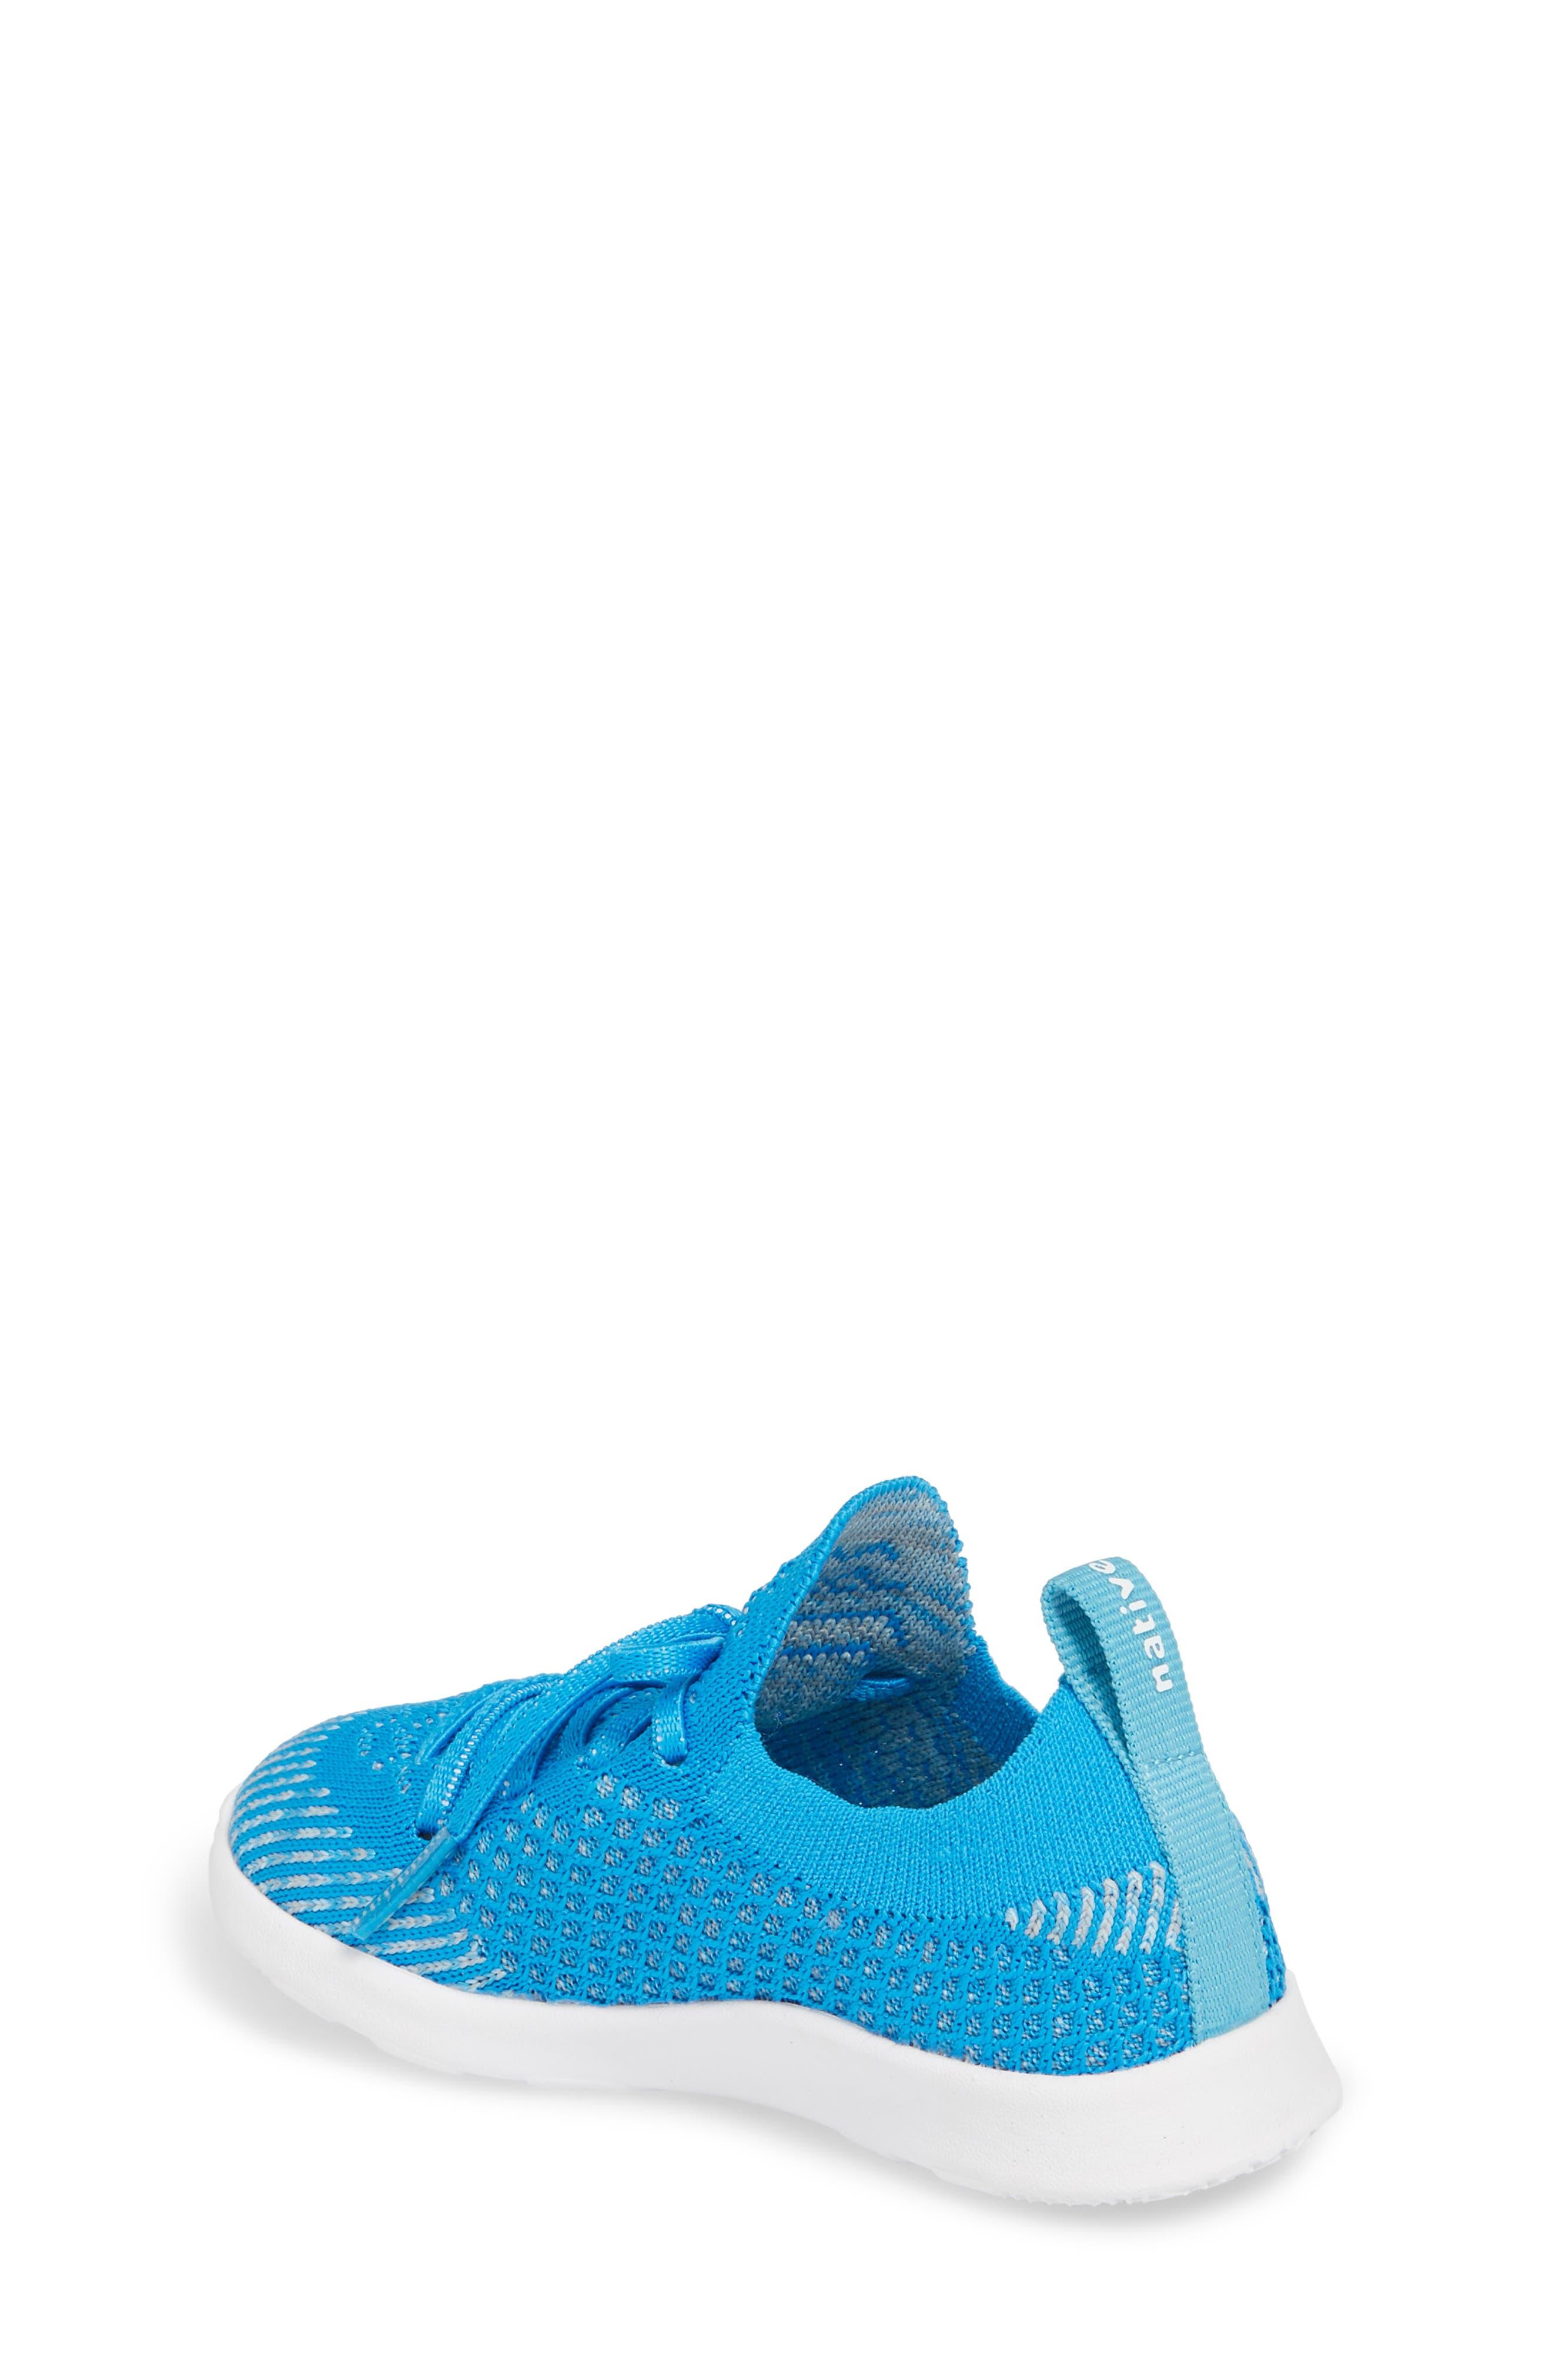 AP Mercury LiteKnit Sneaker,                             Alternate thumbnail 2, color,                             Wave Blue/ Shell White